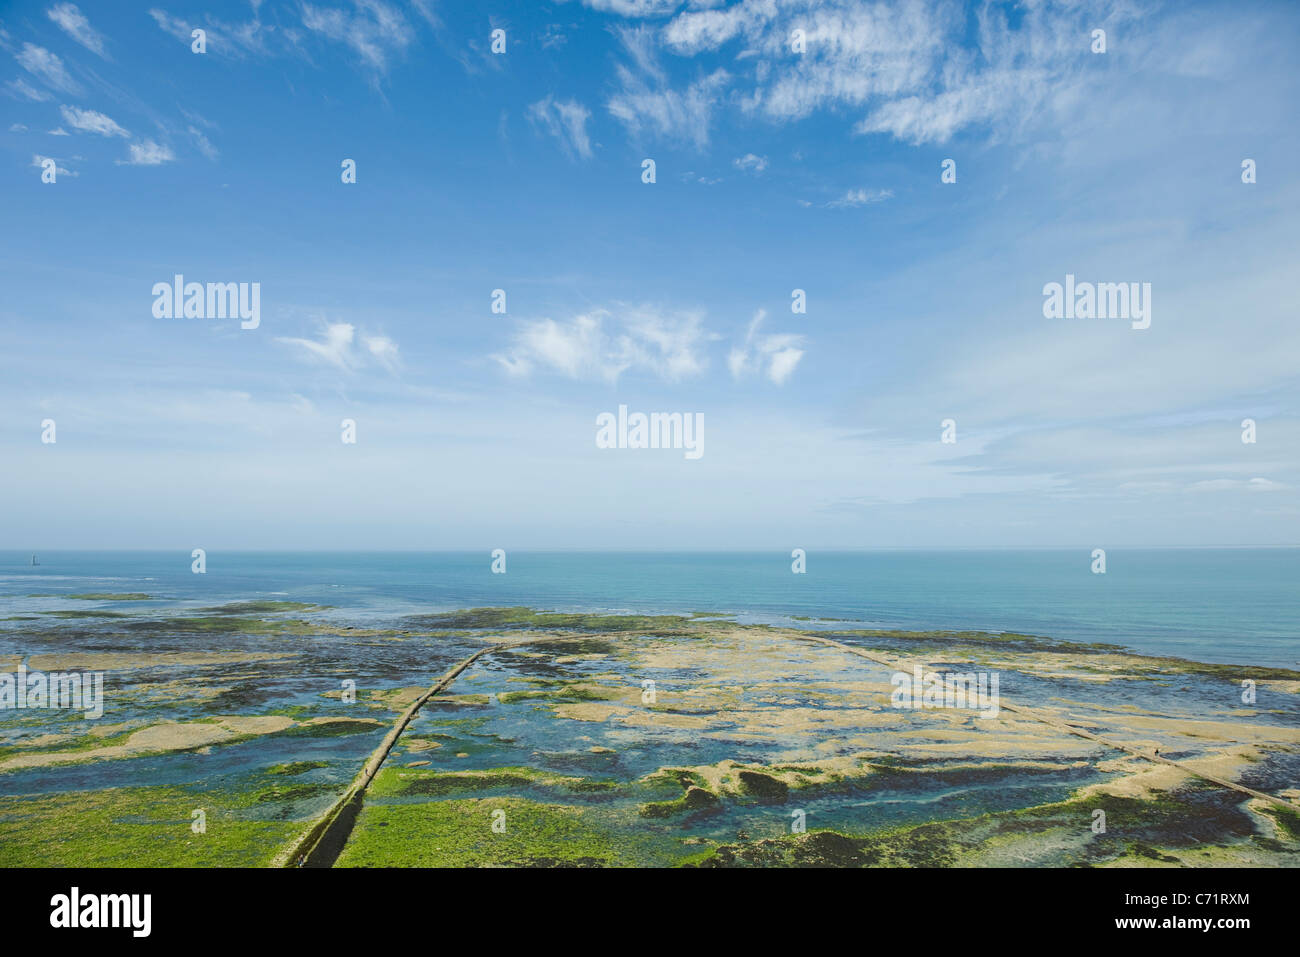 Aerial view of coastal Ile de RŽ, Charente-Maritime, France - Stock Image